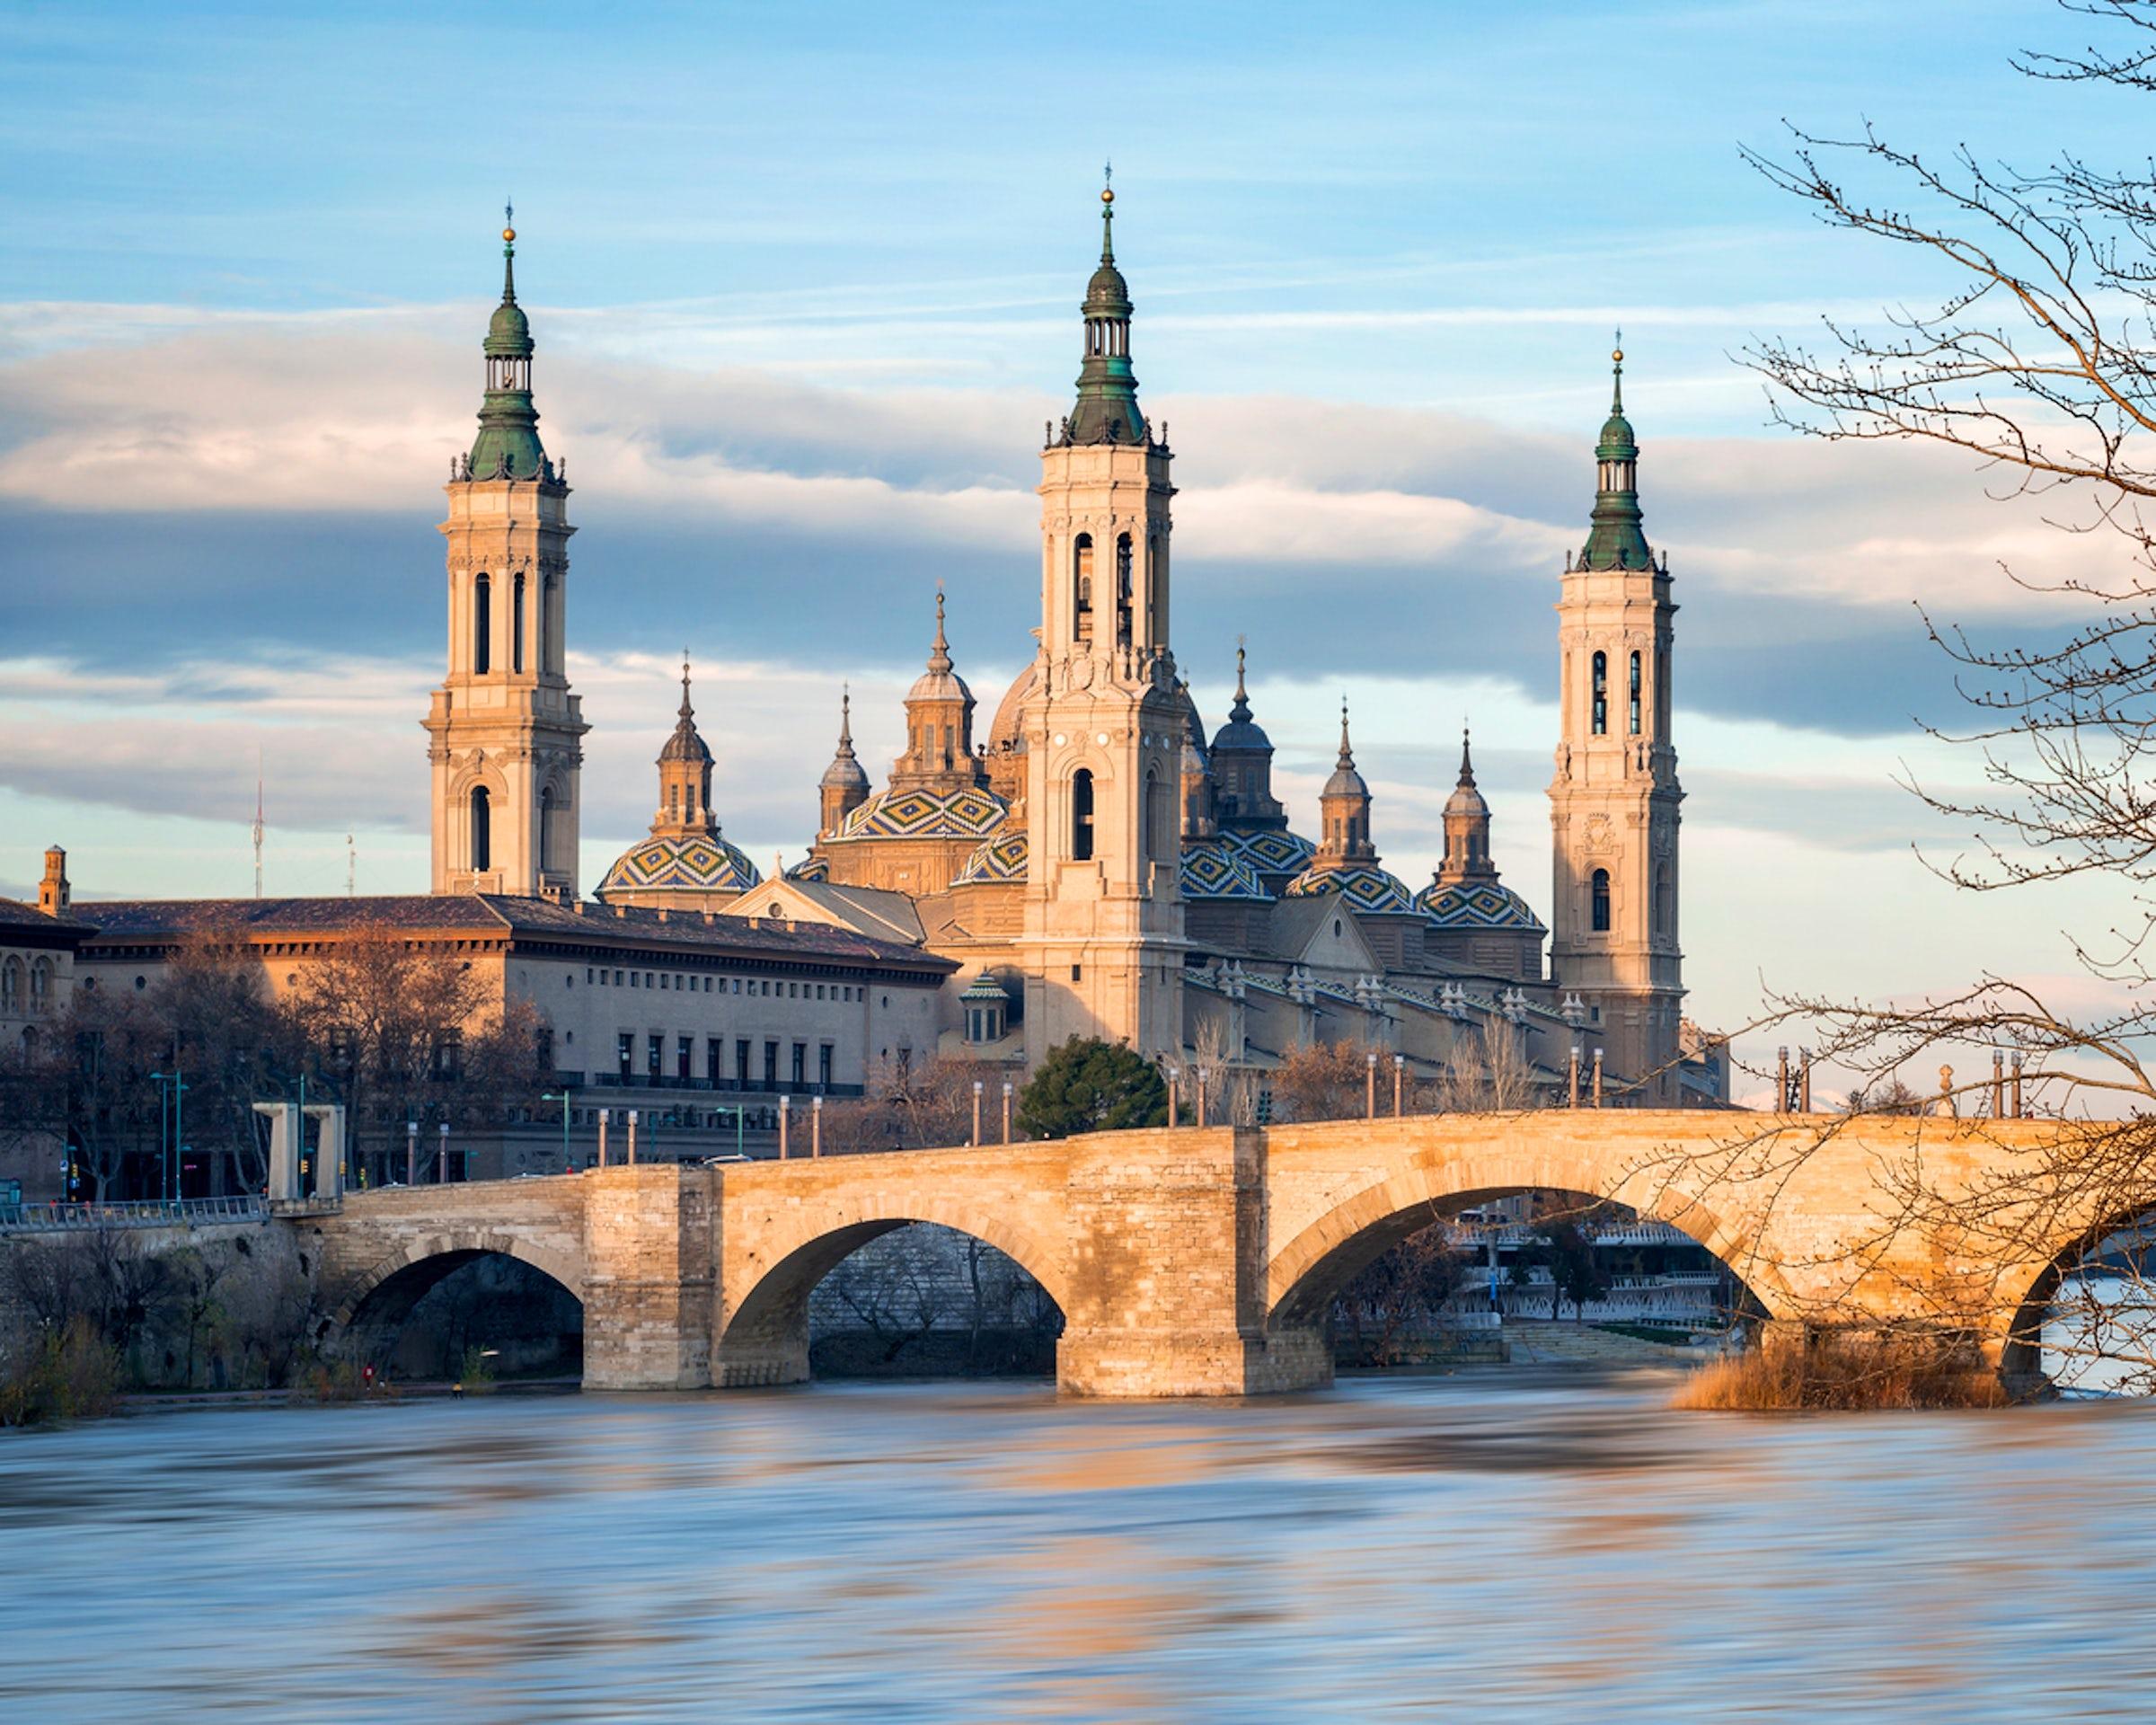 First time in Zaragoza